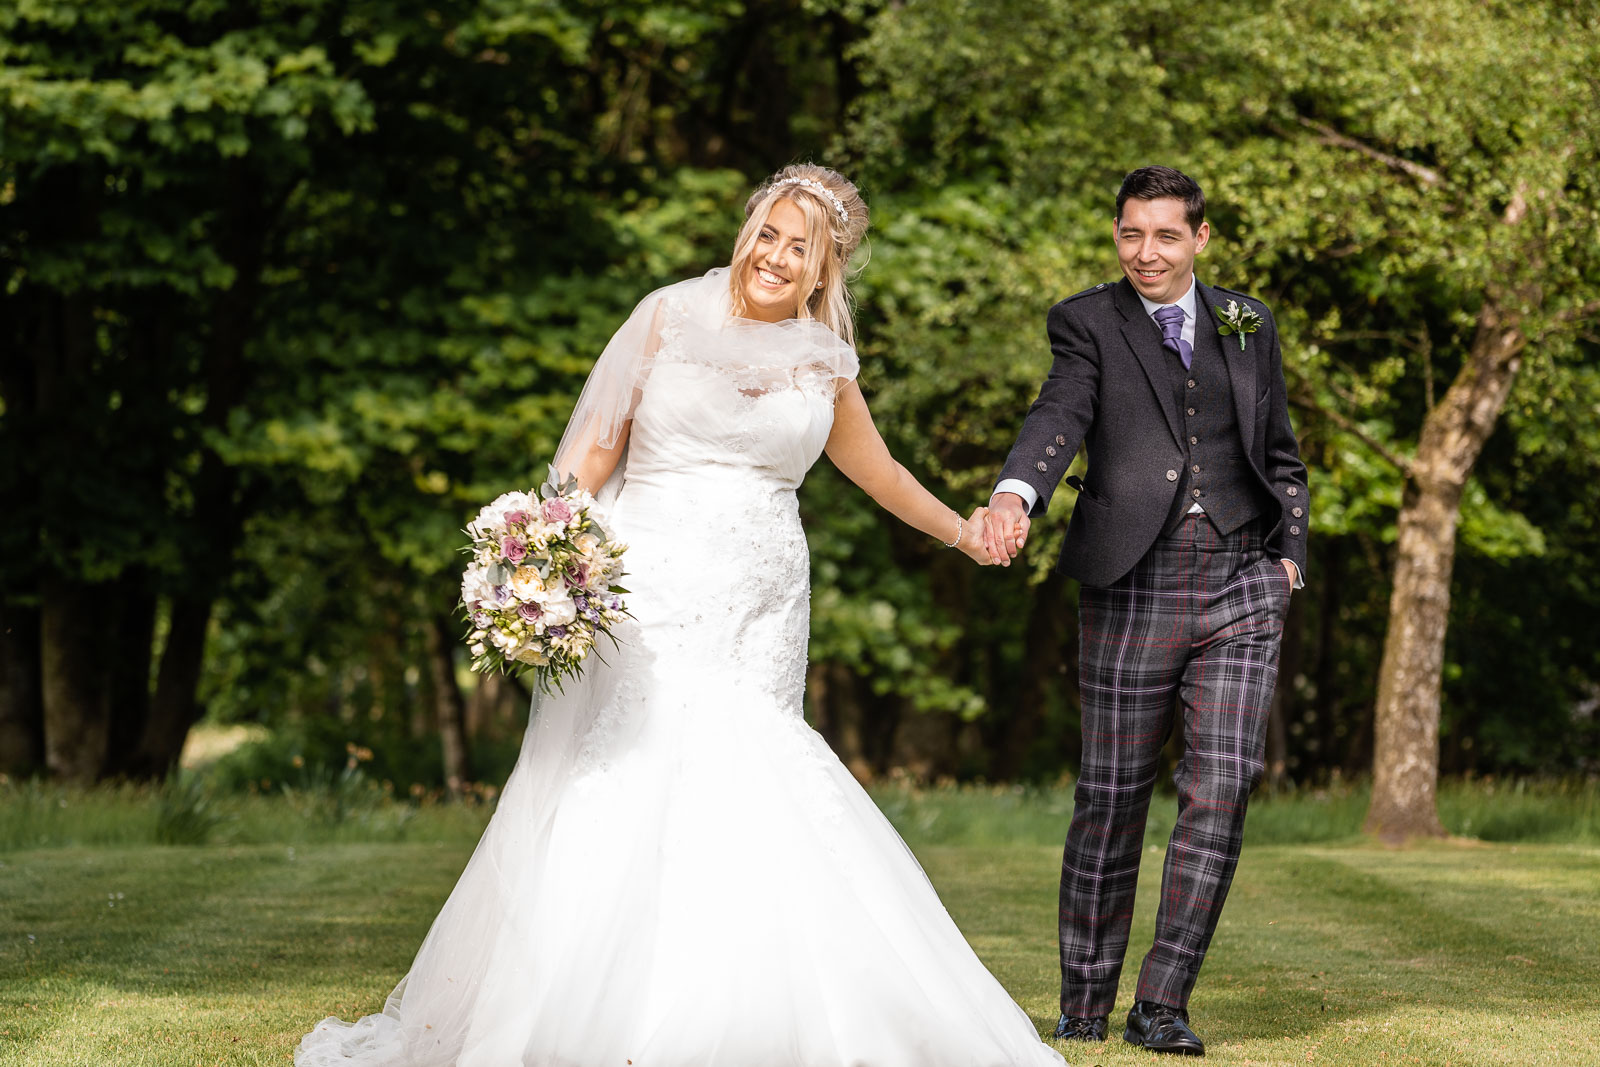 cornhill_castle_wedding_biggar_dearlyphotography (230 of 448).jpg